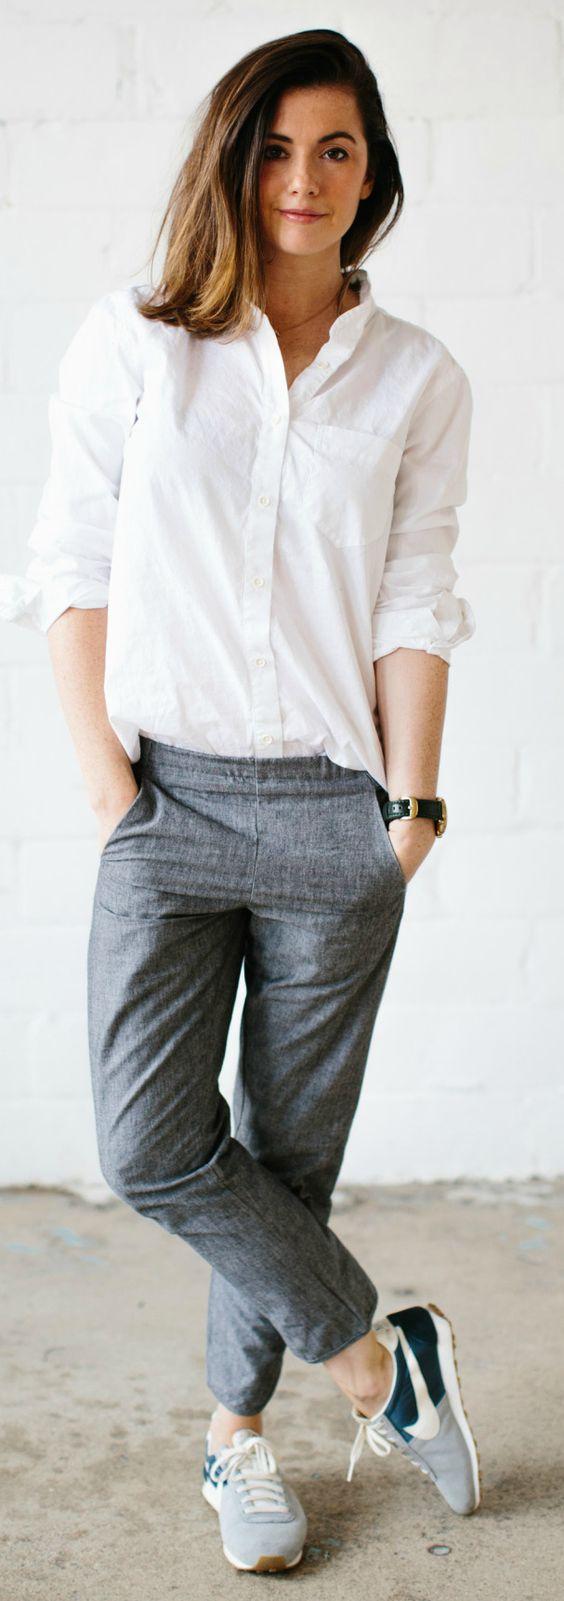 Como Usar Un Pantalon Formal Con Tenis Asesoria De Imagen Personal